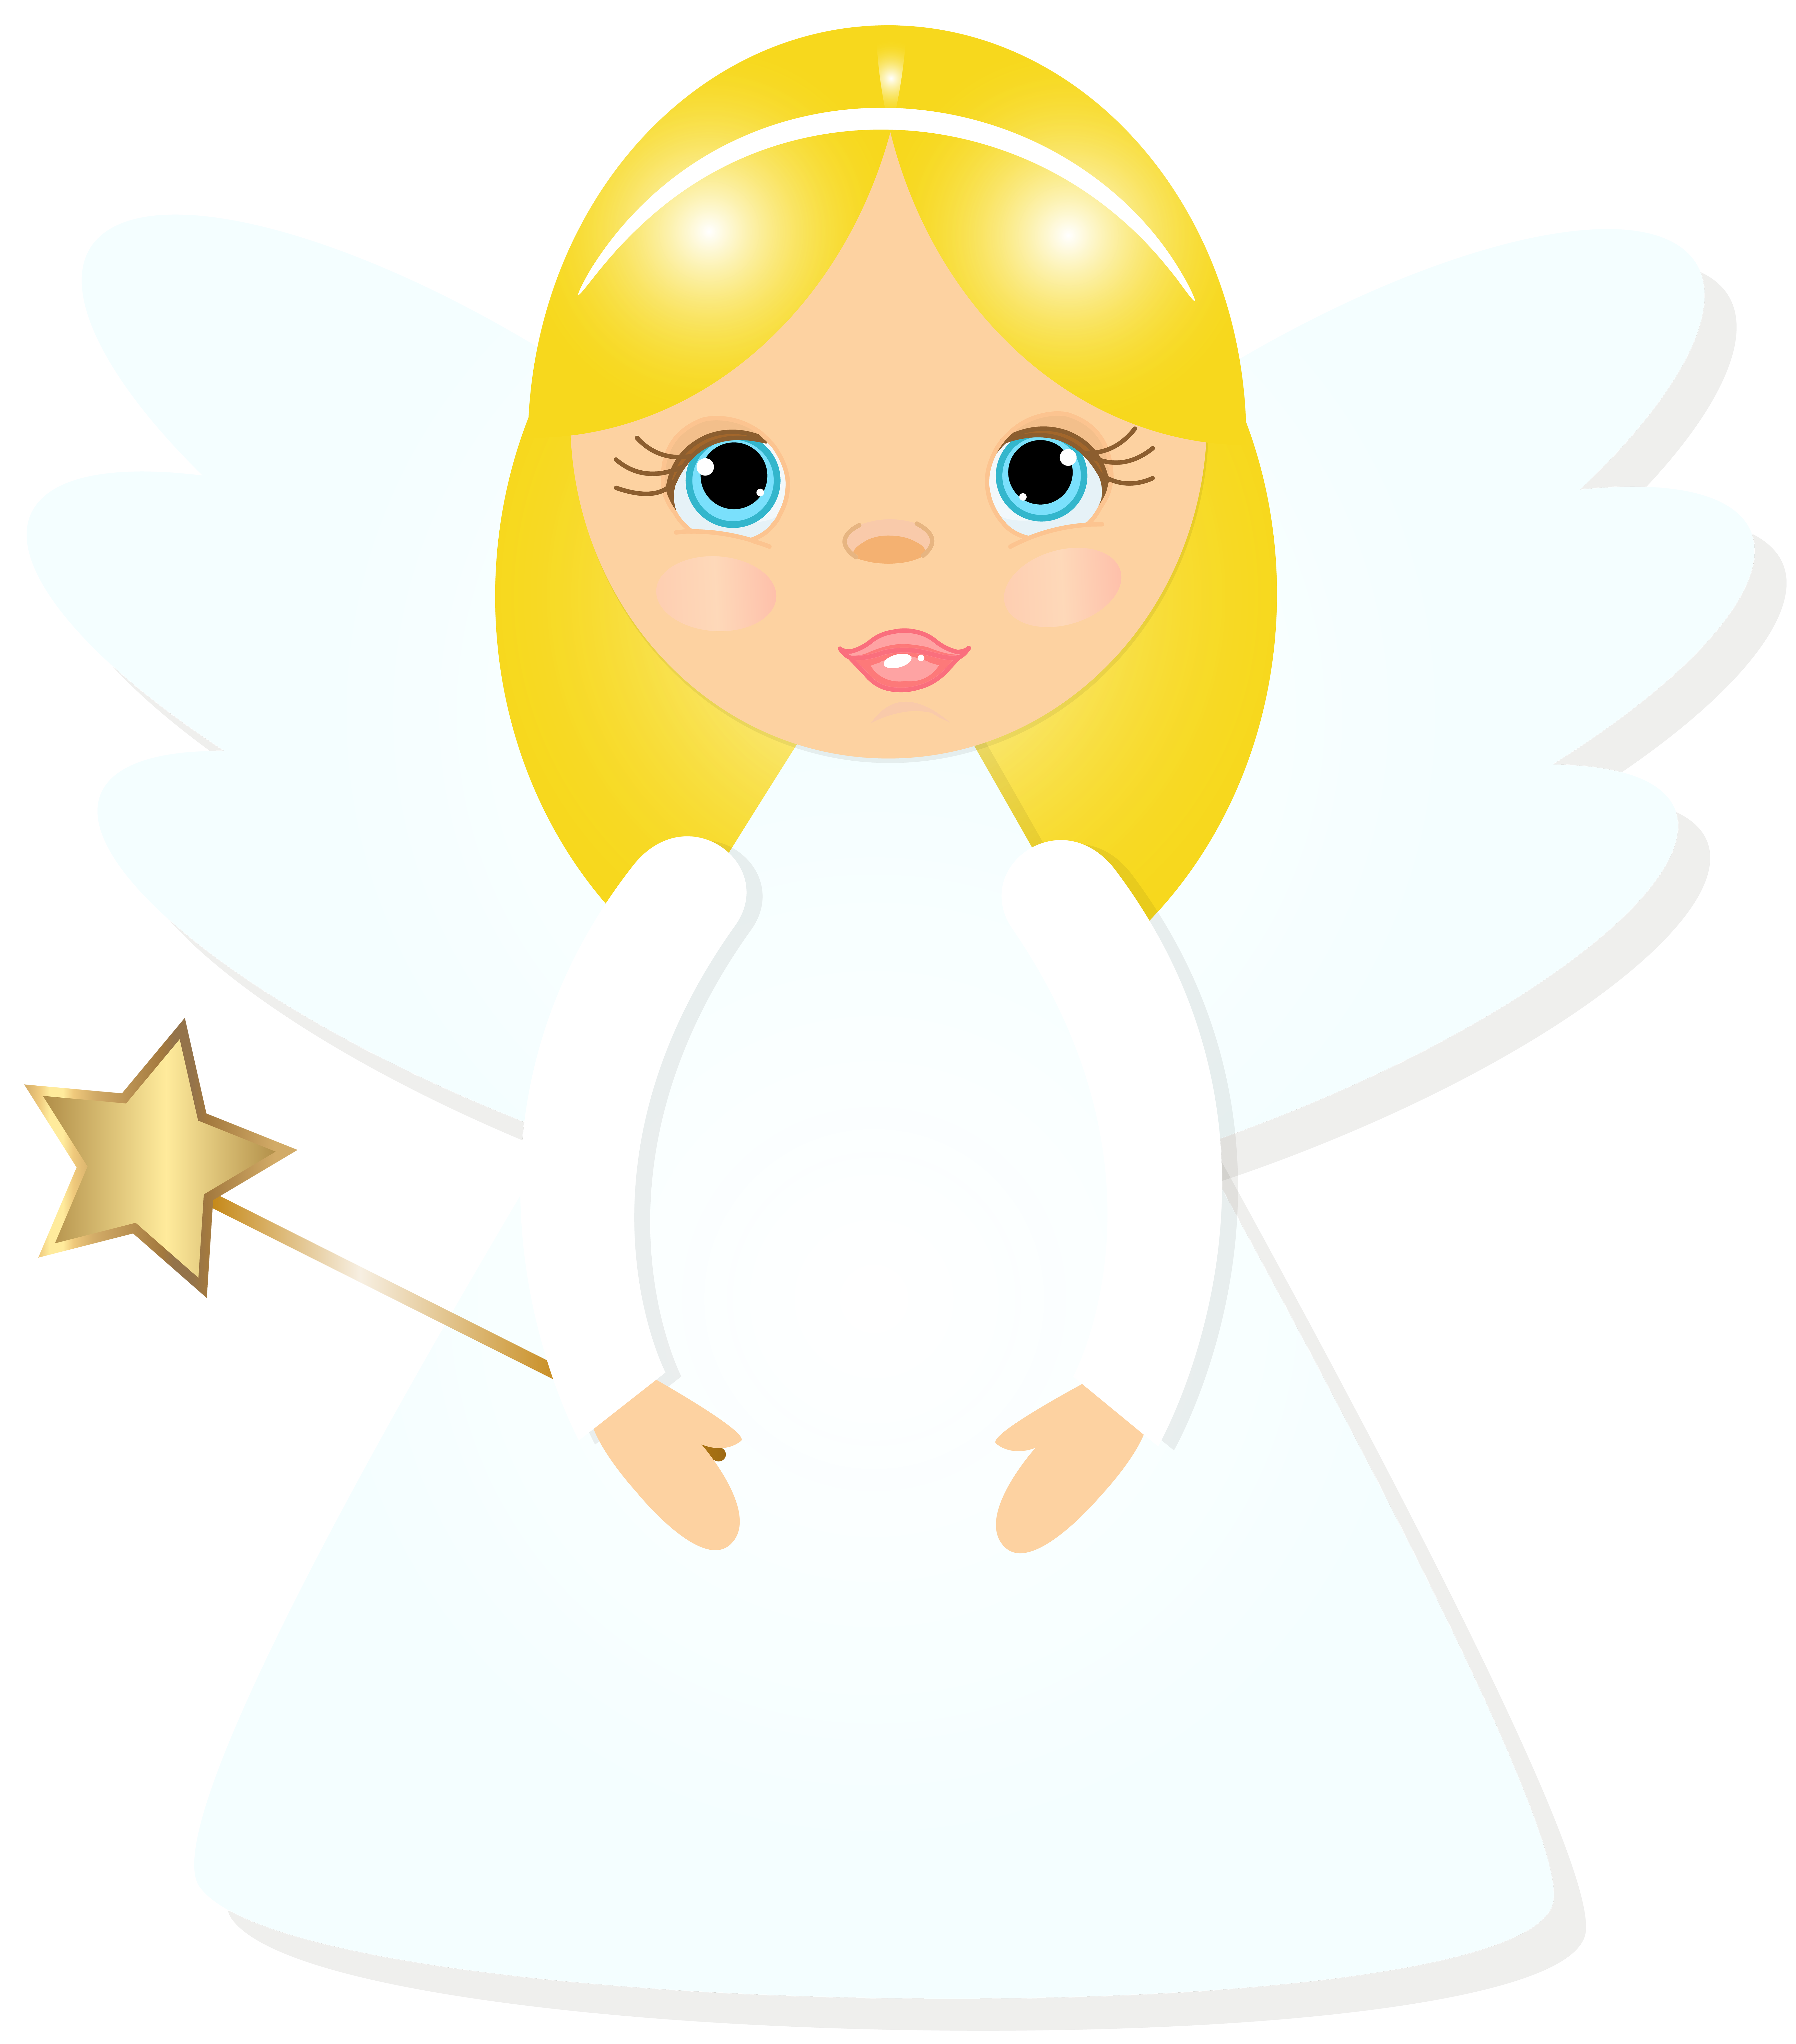 Angel clipart transparent background. Christmas png clip art